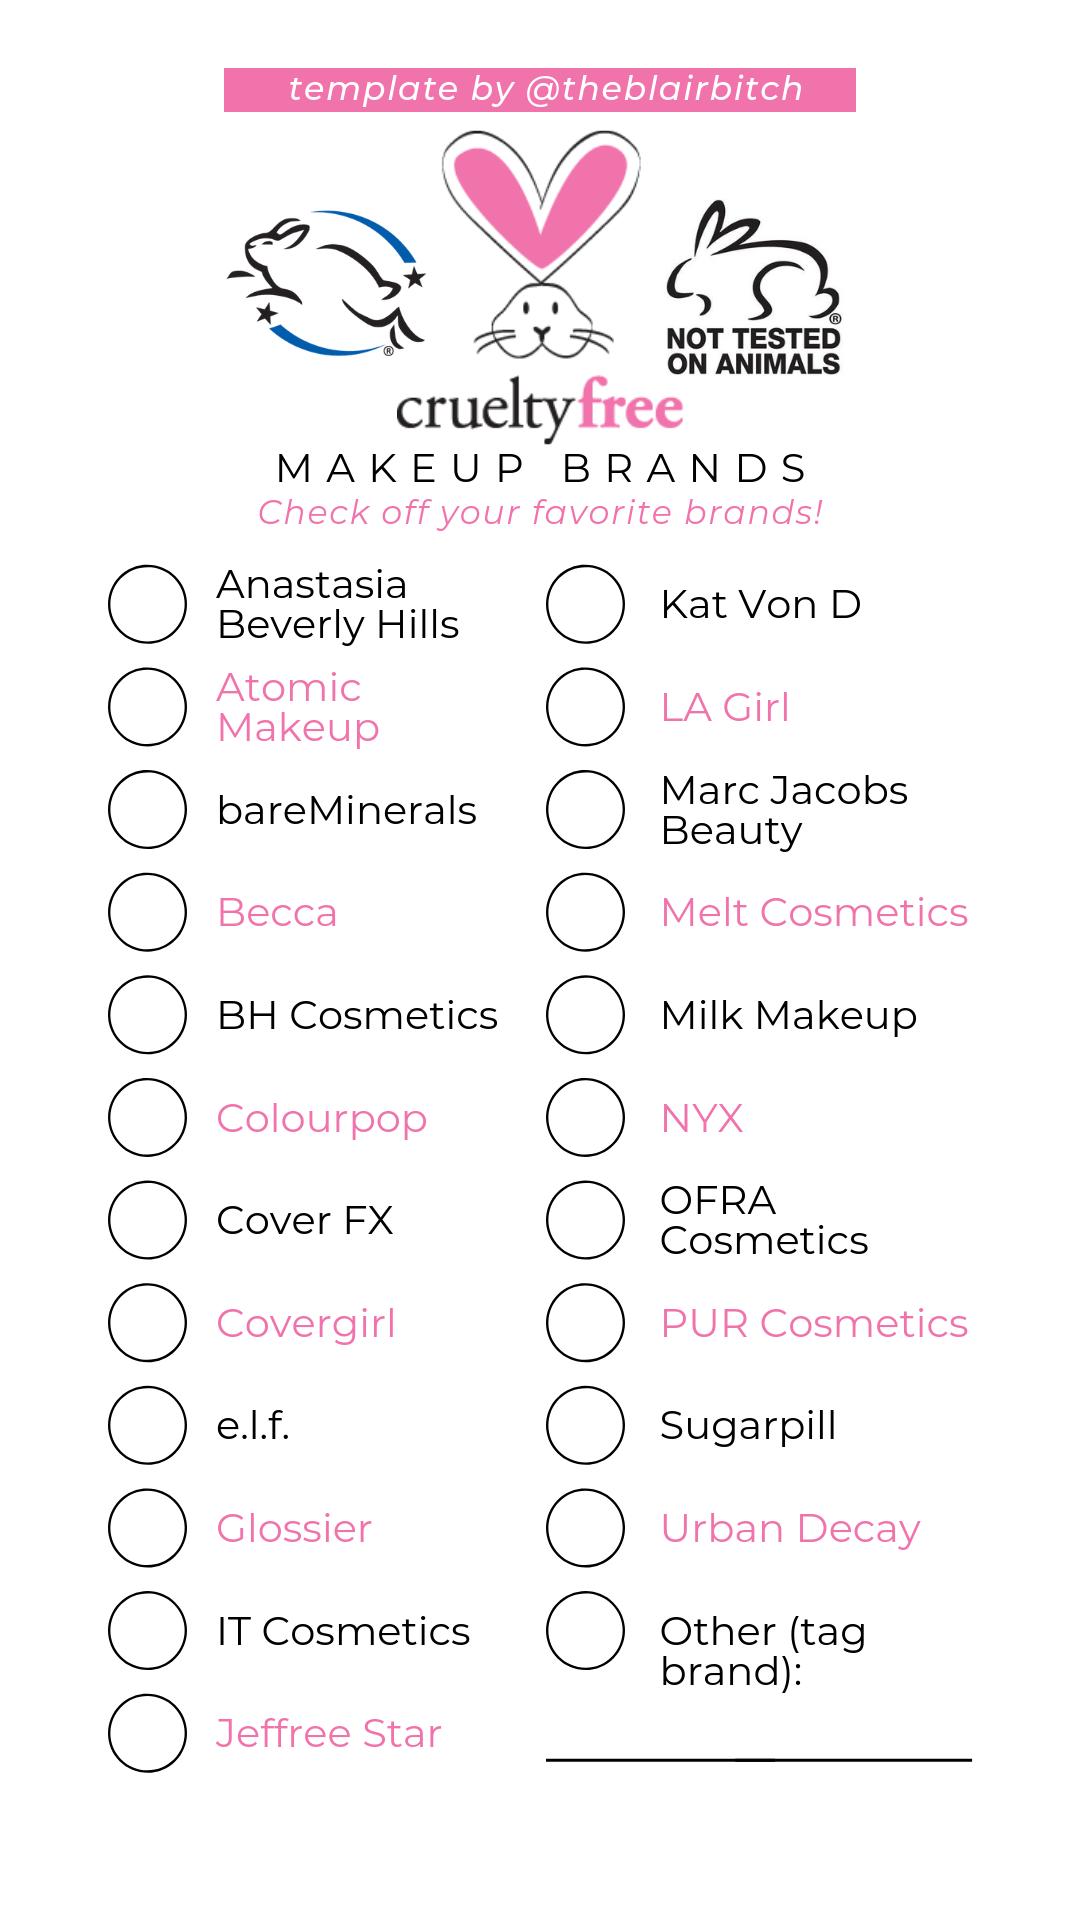 Cruelty Free Makeup Brands Checklist Instagram Story